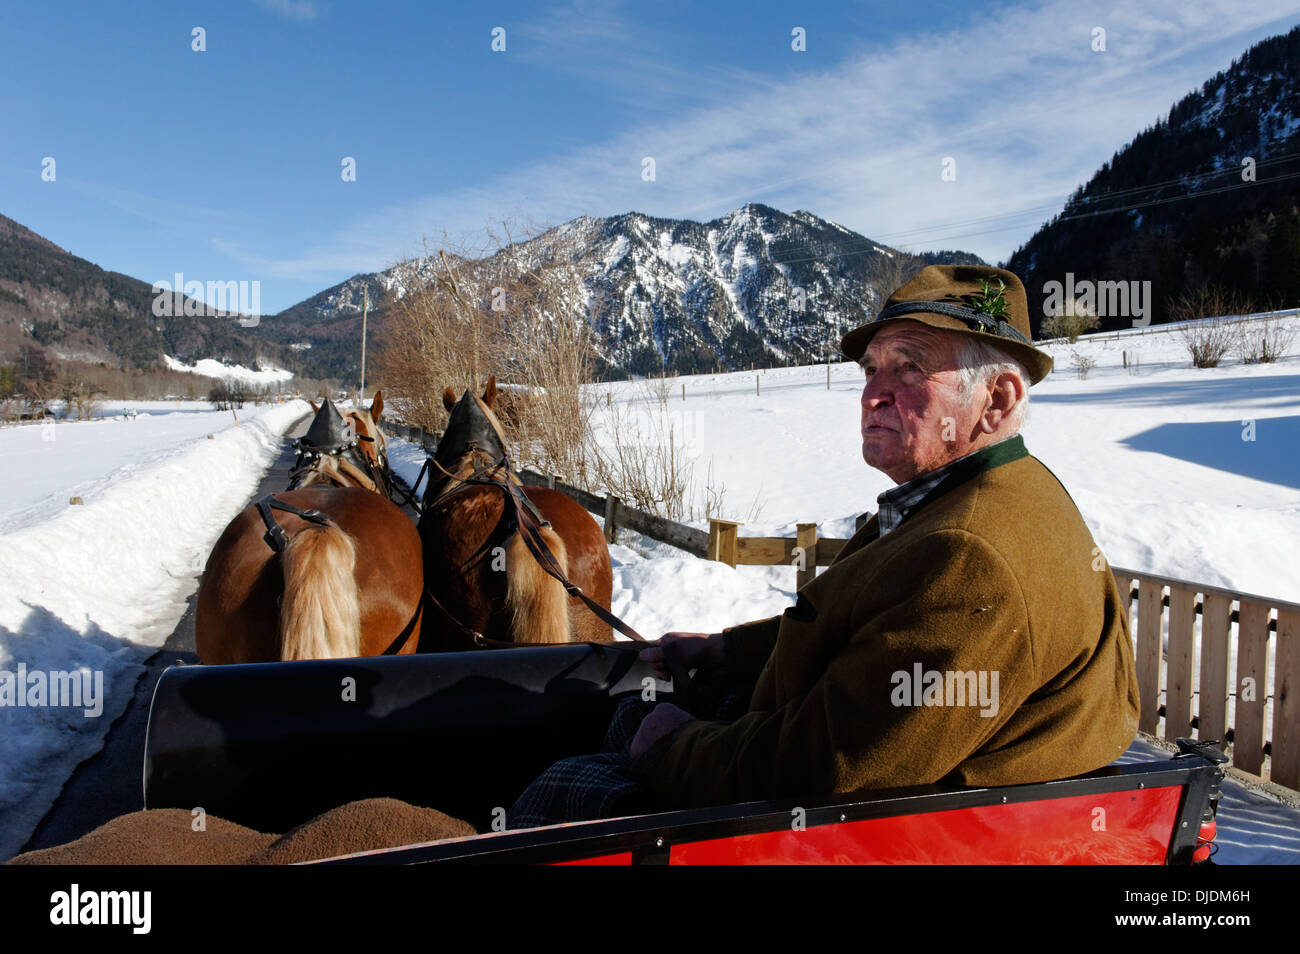 Coachman, sleigh ride from Rottach to the Weissachalm in Weissachtal Valley, Tegernseer Land Region, Upper Bavaria, Bavaria - Stock Image